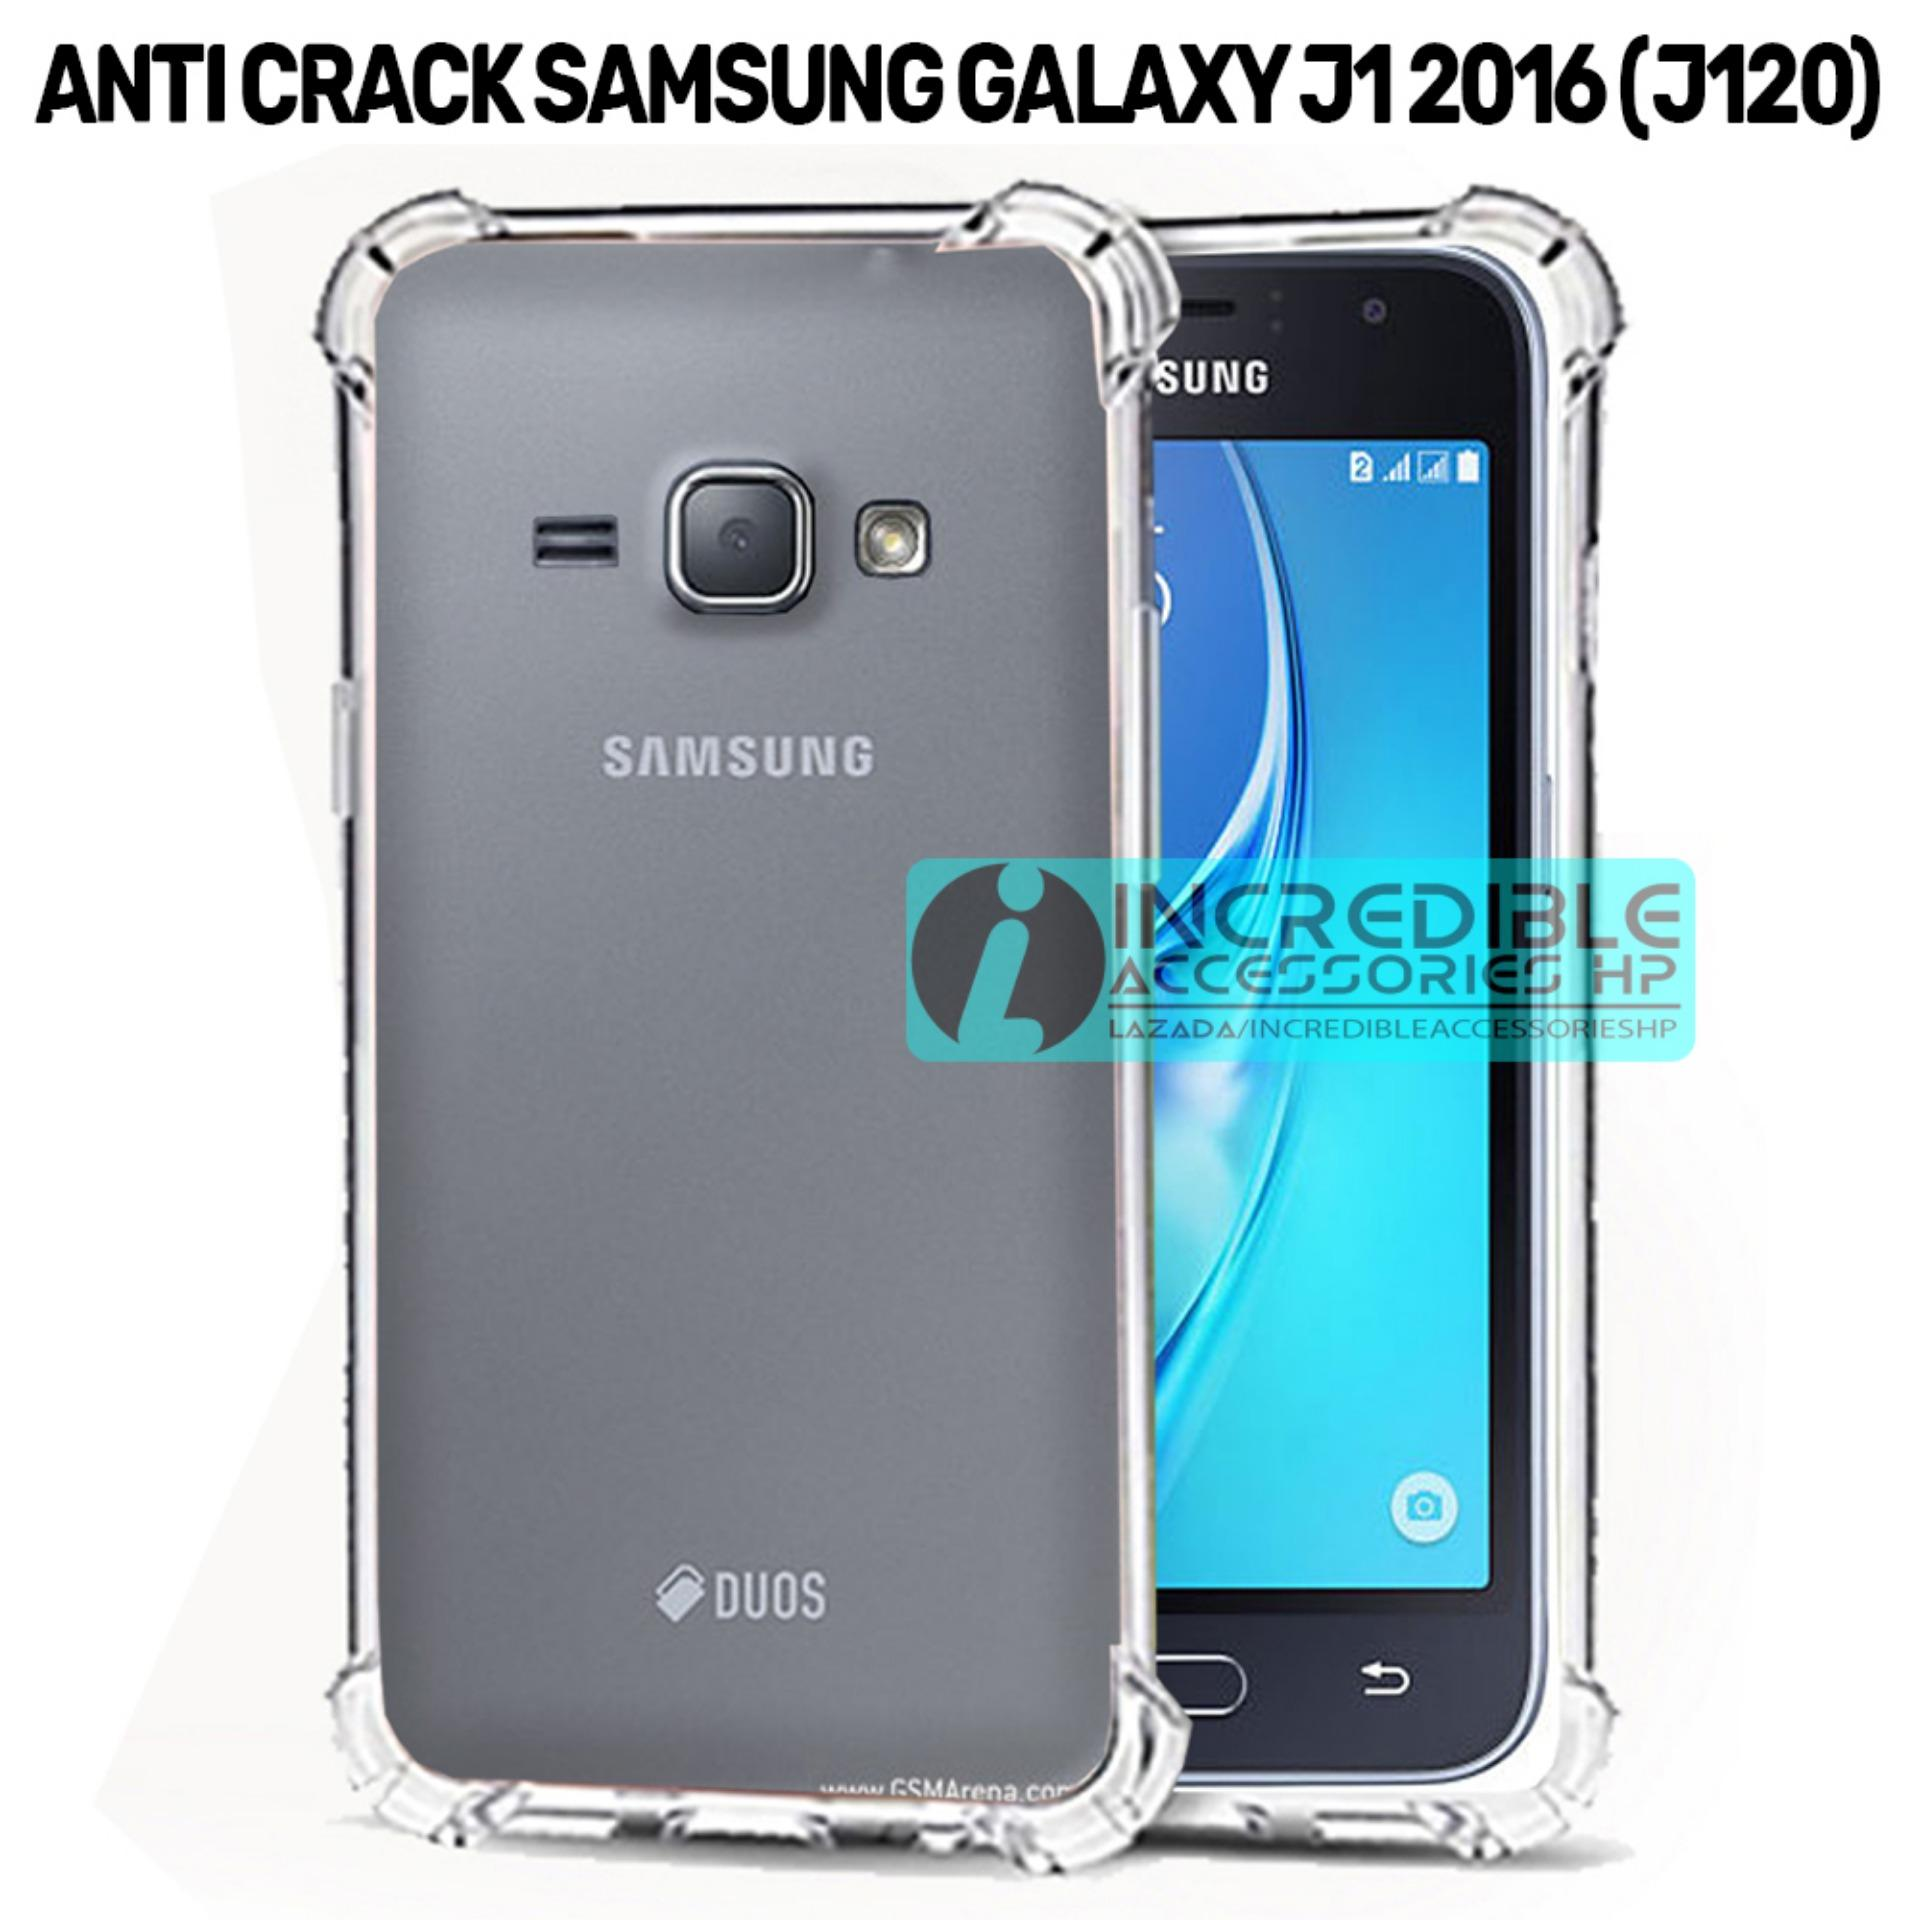 Case Anti Shock / Anti Crack Elegant Softcase  for Samsung Galaxy J1 2016 (J120) - White Clear